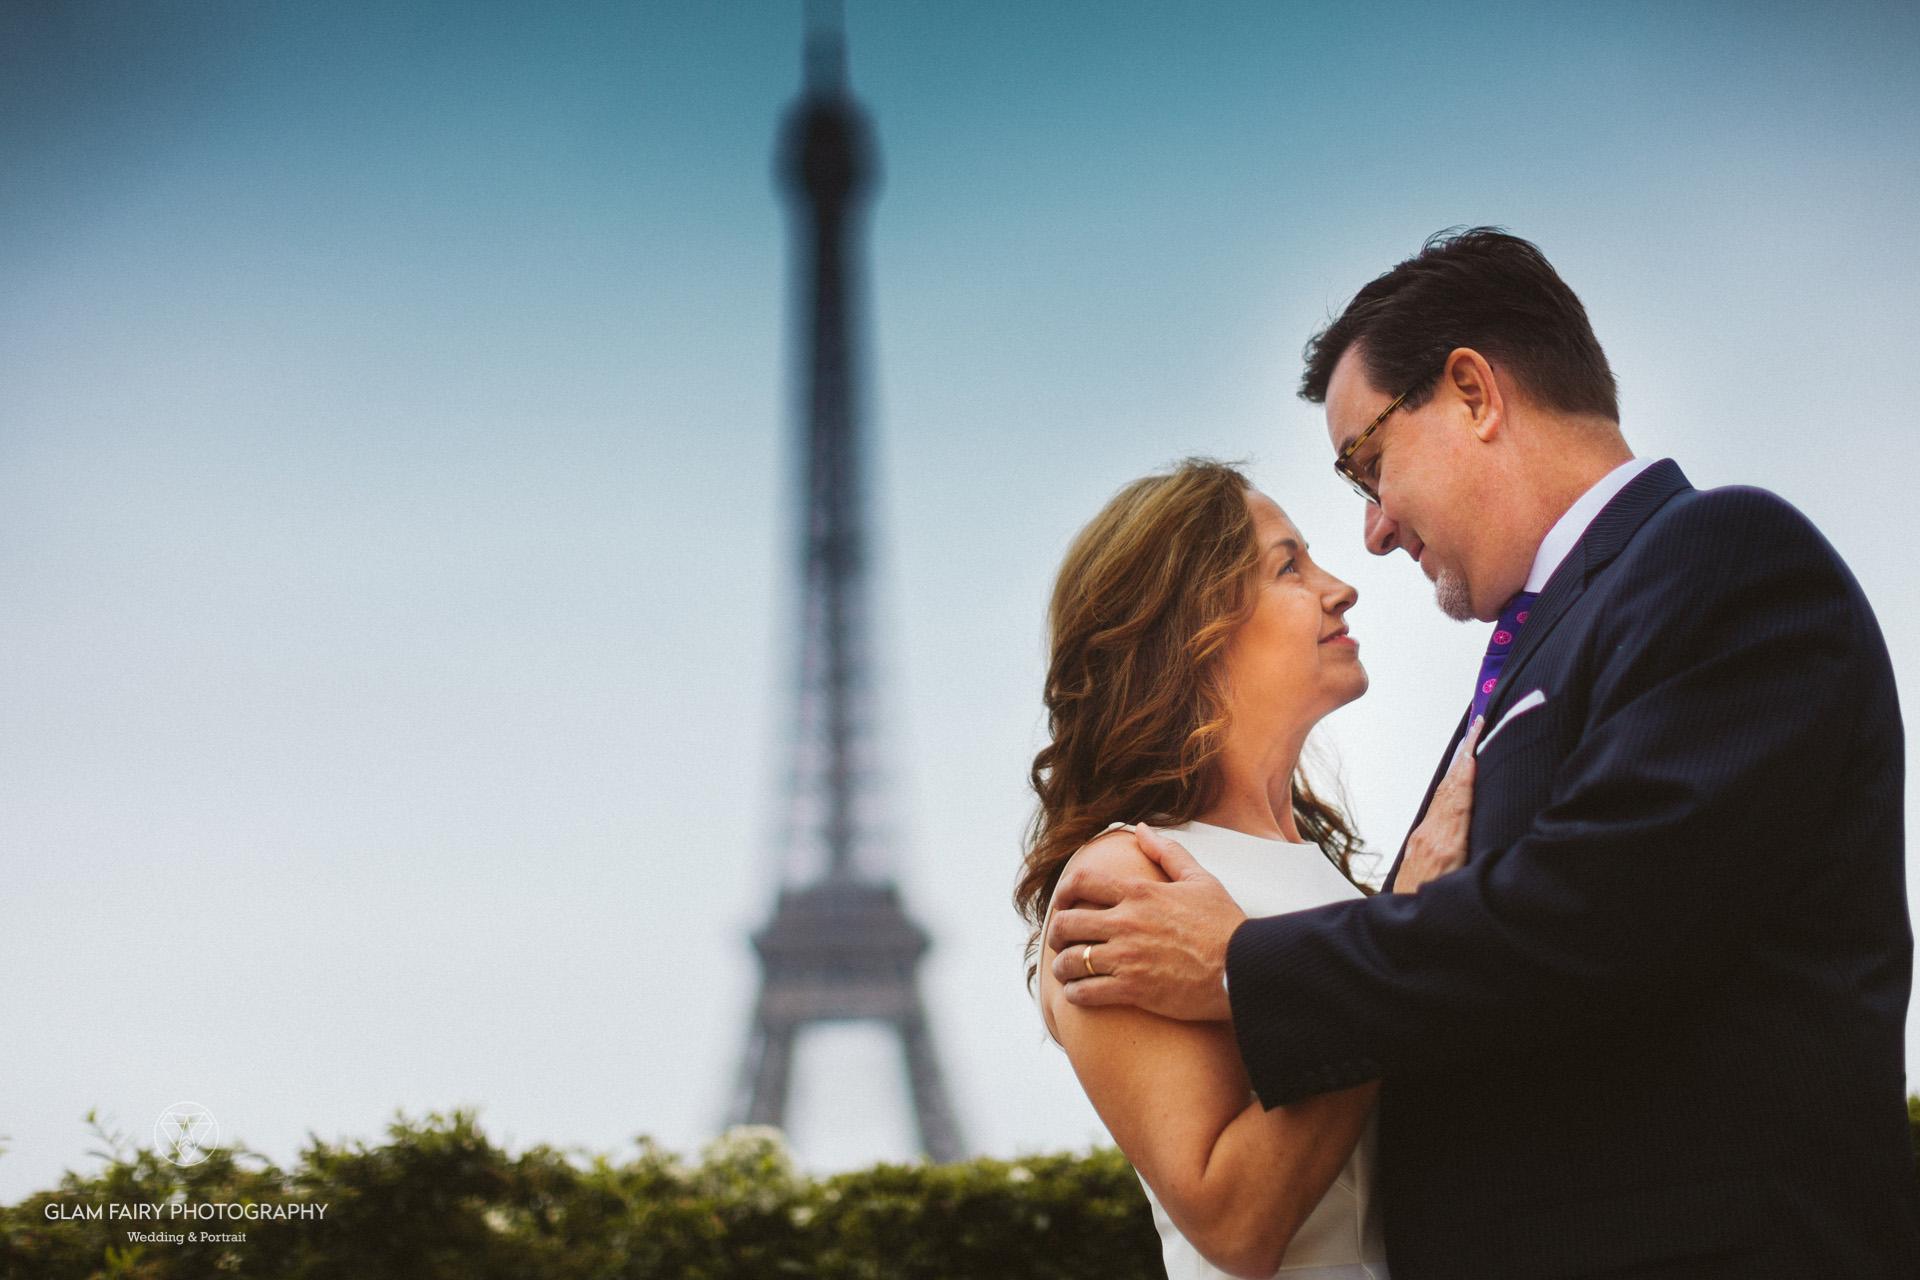 GlamFairyPhotography-boudoirphotography-lovesession-a-la-tour-eiffel-jackie-chris